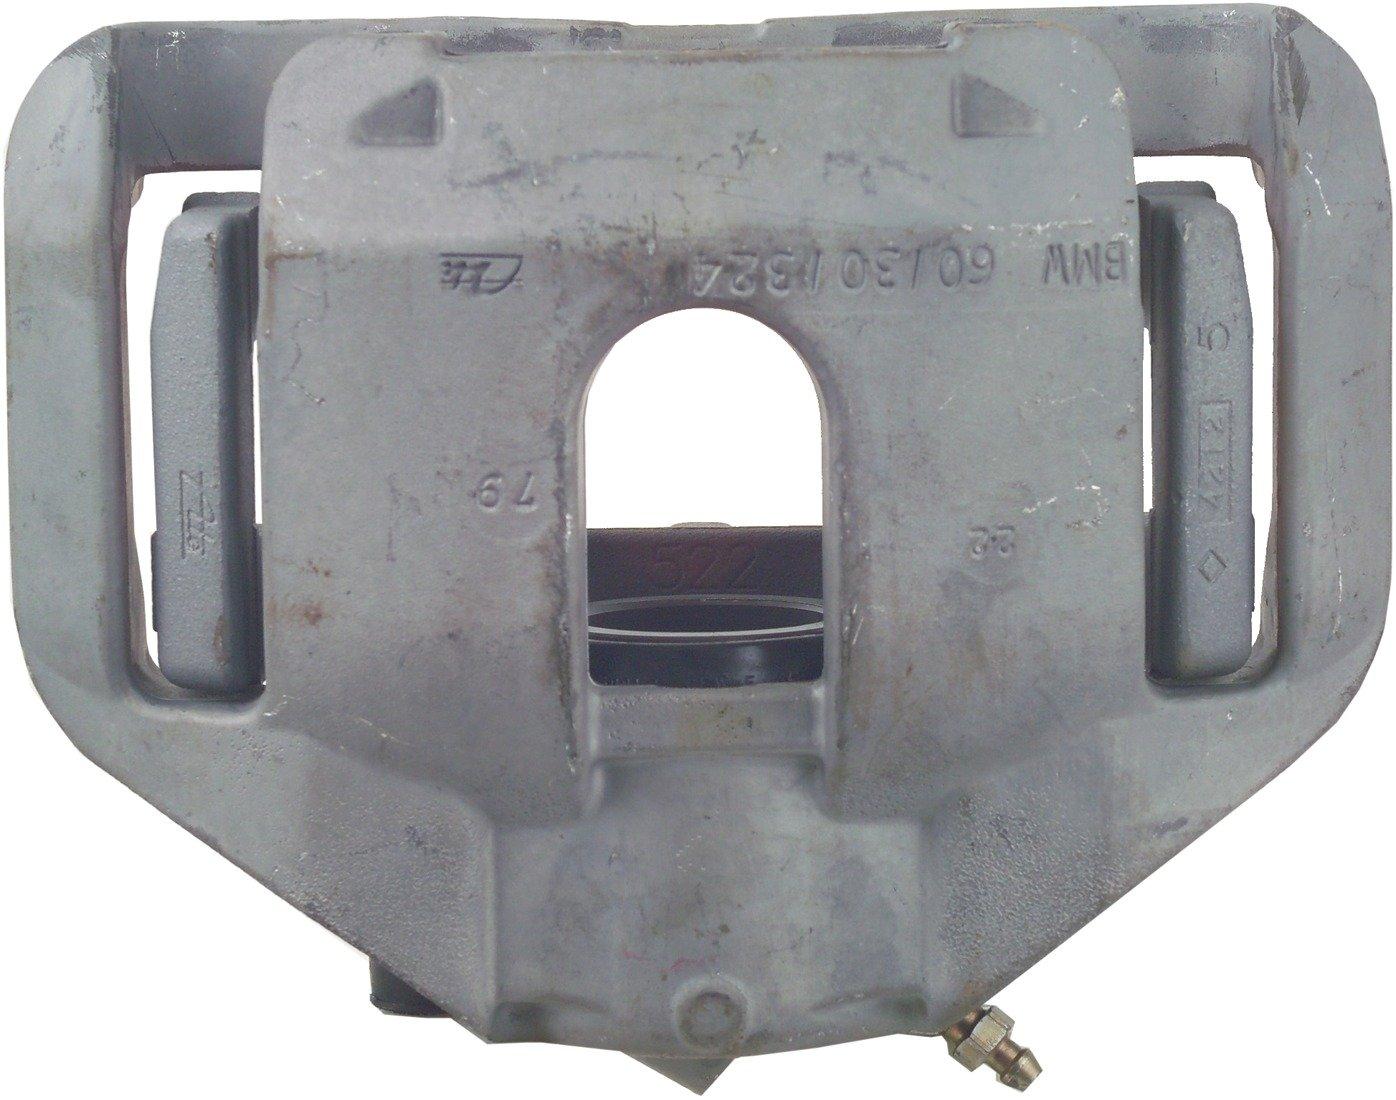 Cardone 19-B2965 Remanufactured Import Friction Ready Brake Caliper Unloaded